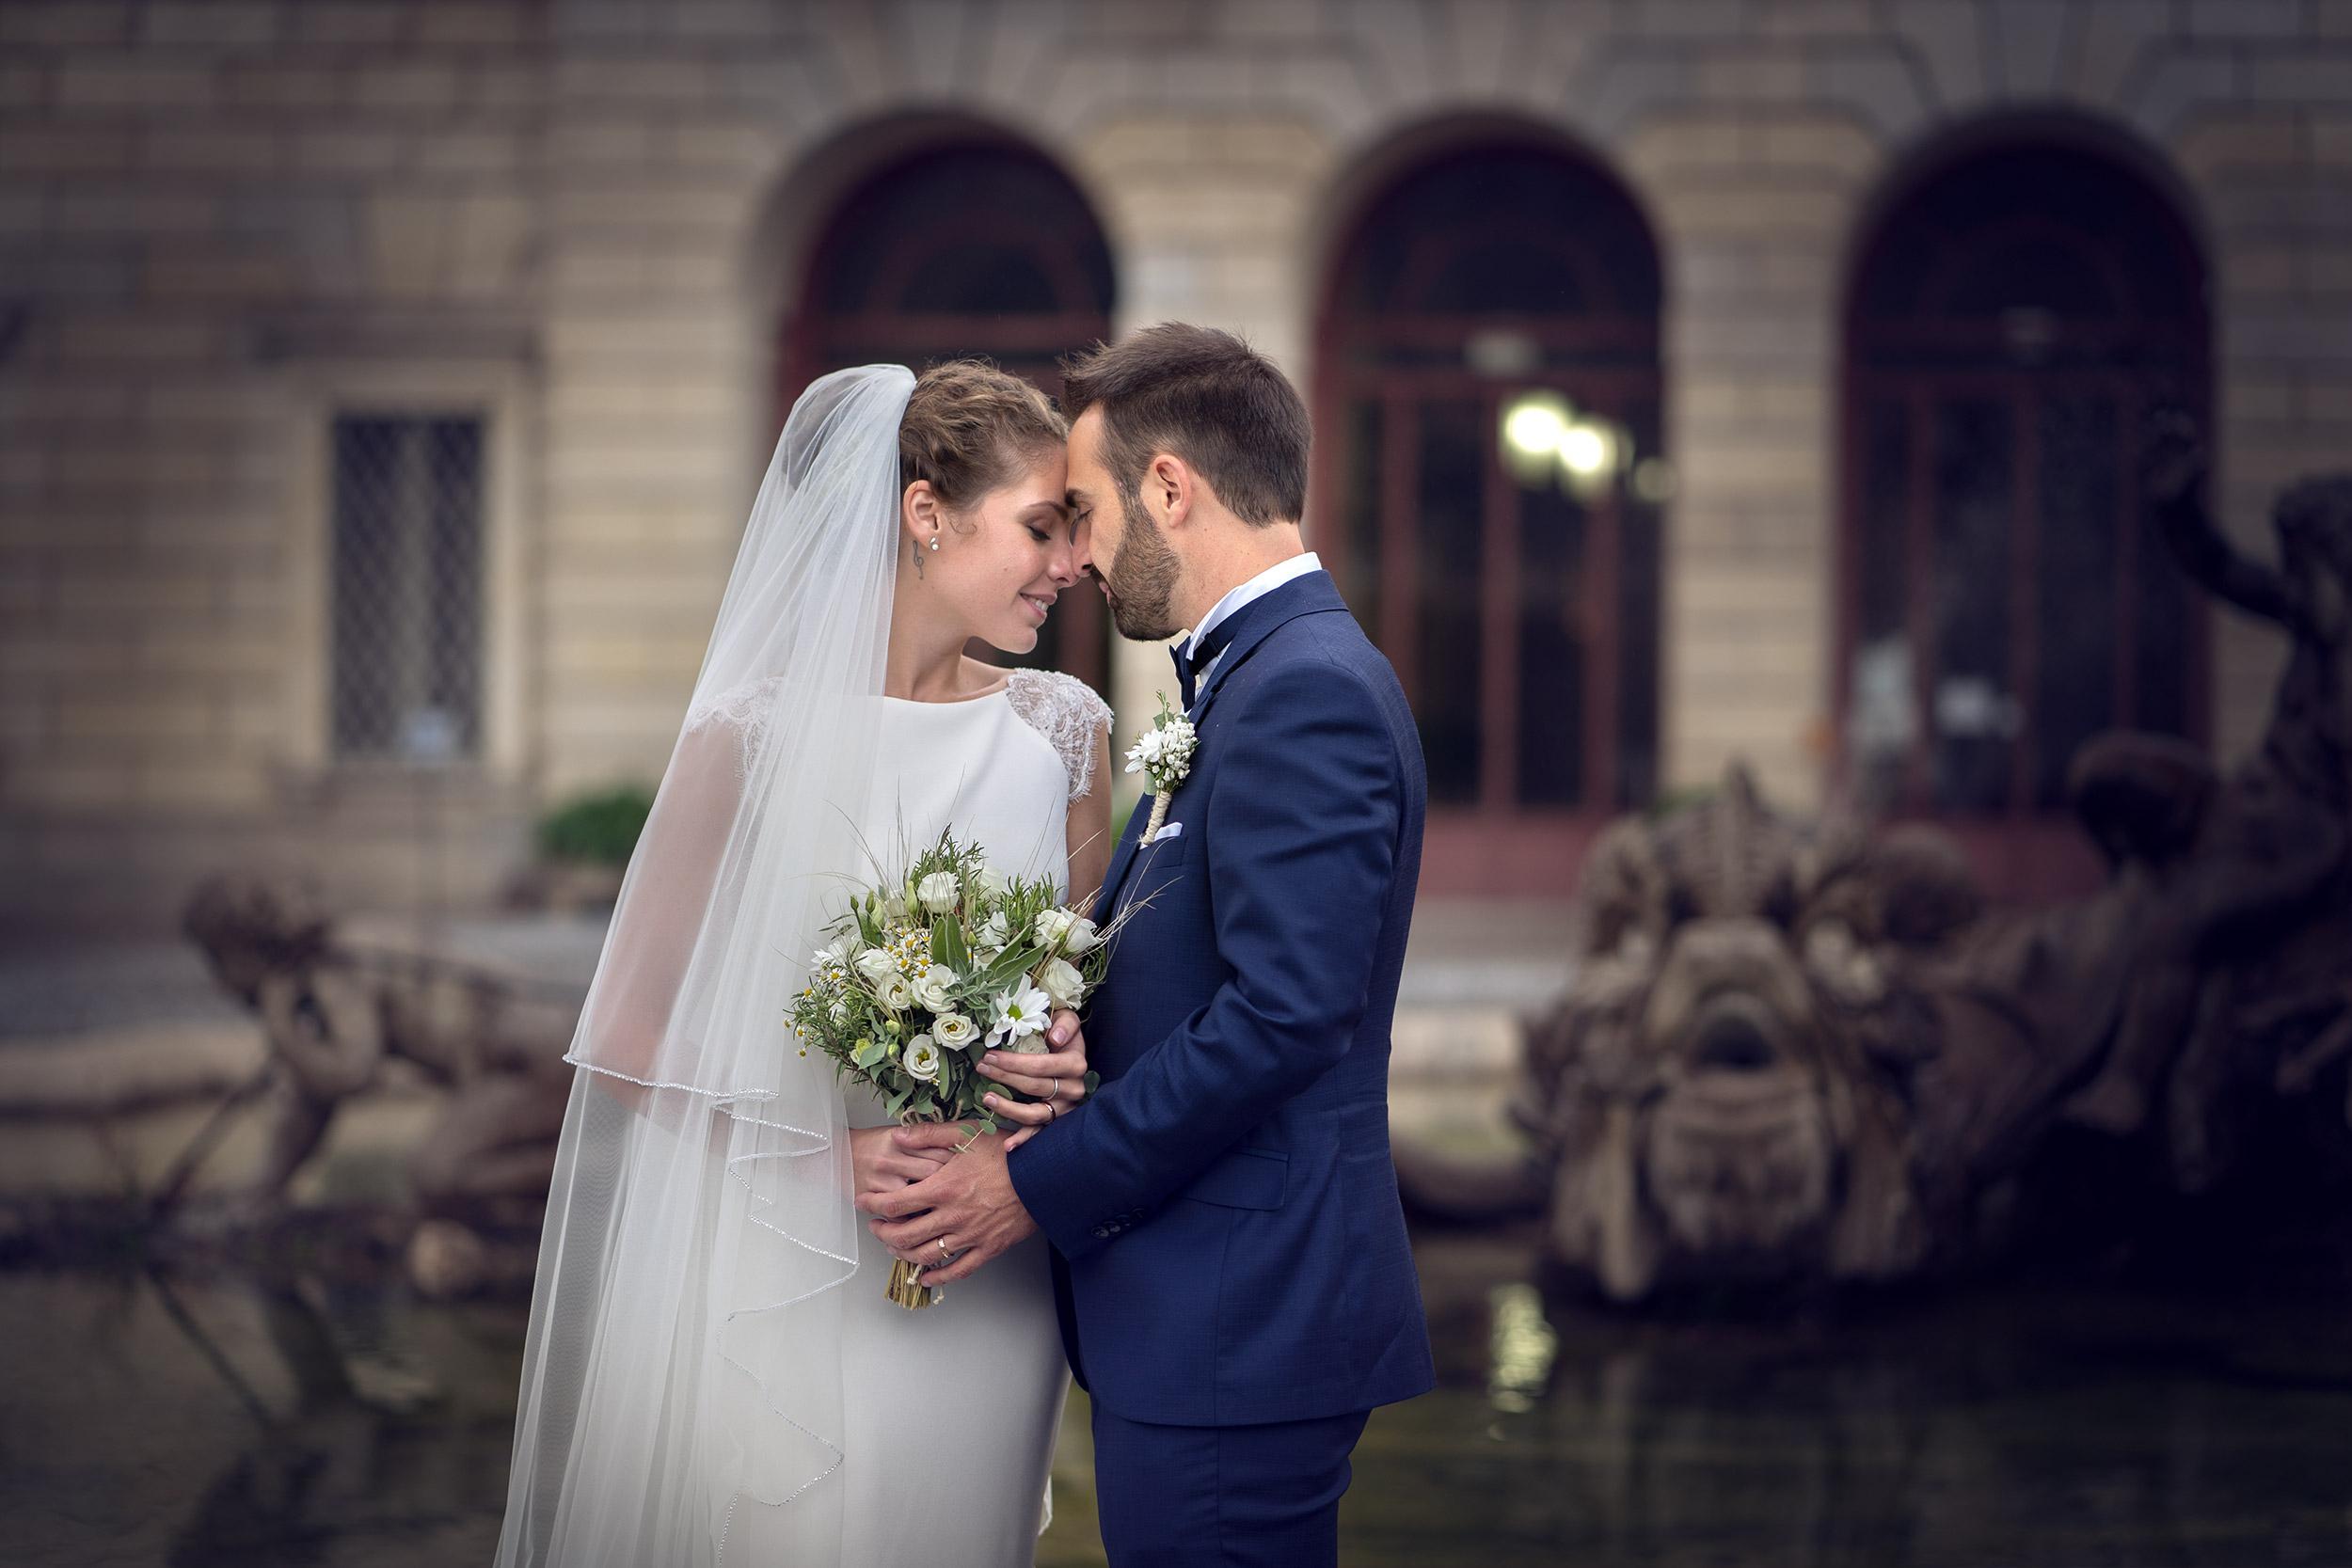 000 reportage sposi foto matrimonio wedding villa olmo como copia 1